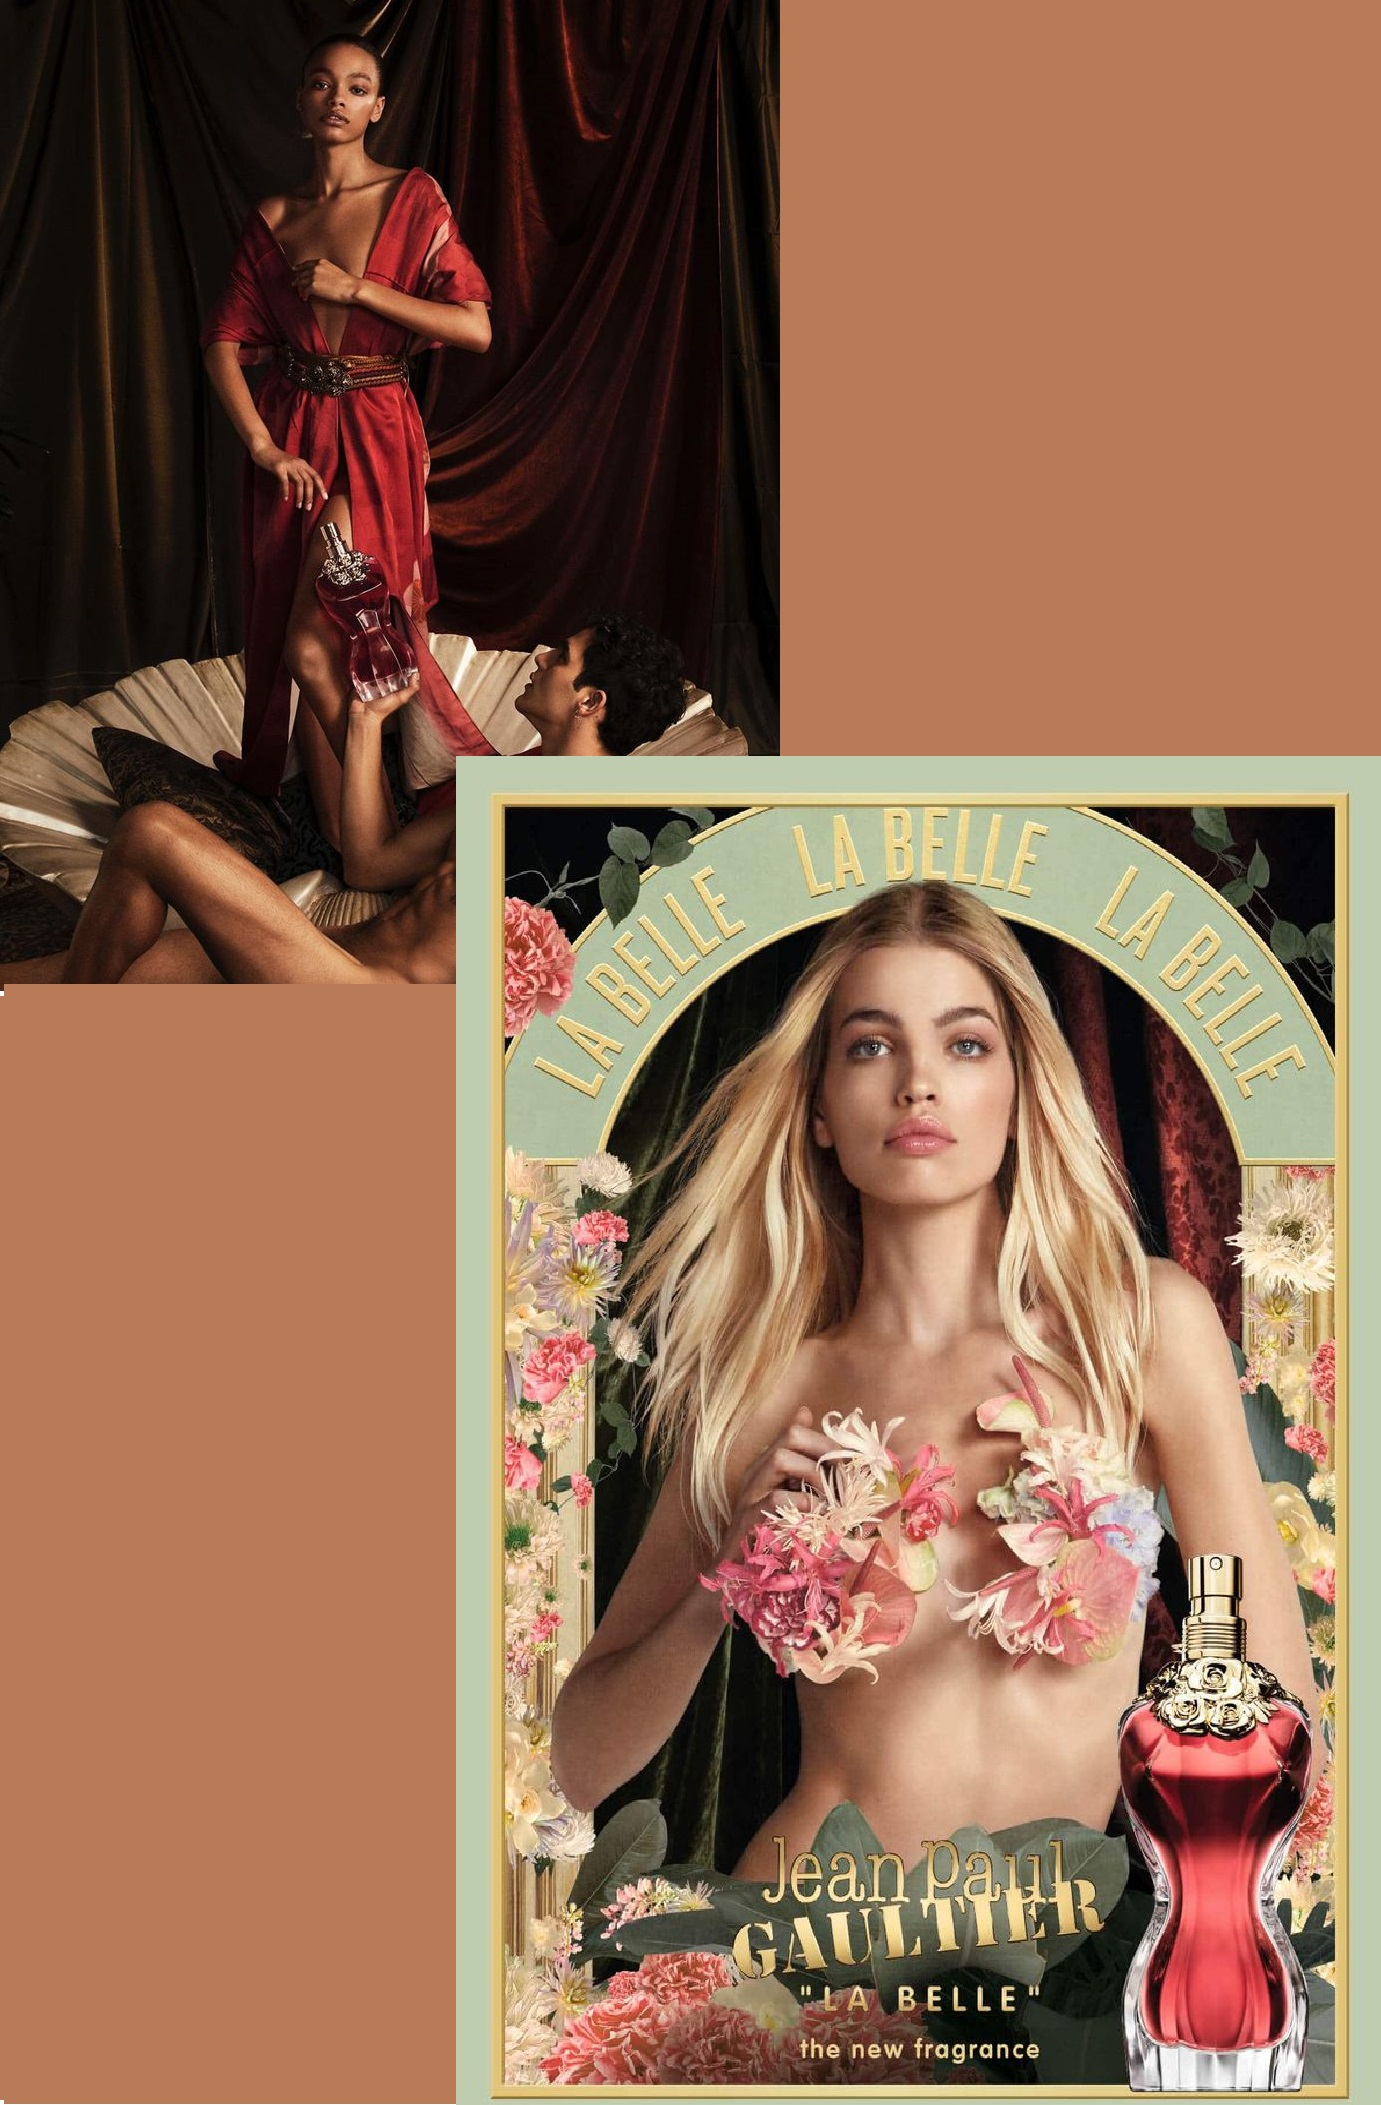 Gorka Postigo for Jean Paul Gaultier La Belle & Le Beau Fragrance (3) combo.jpg